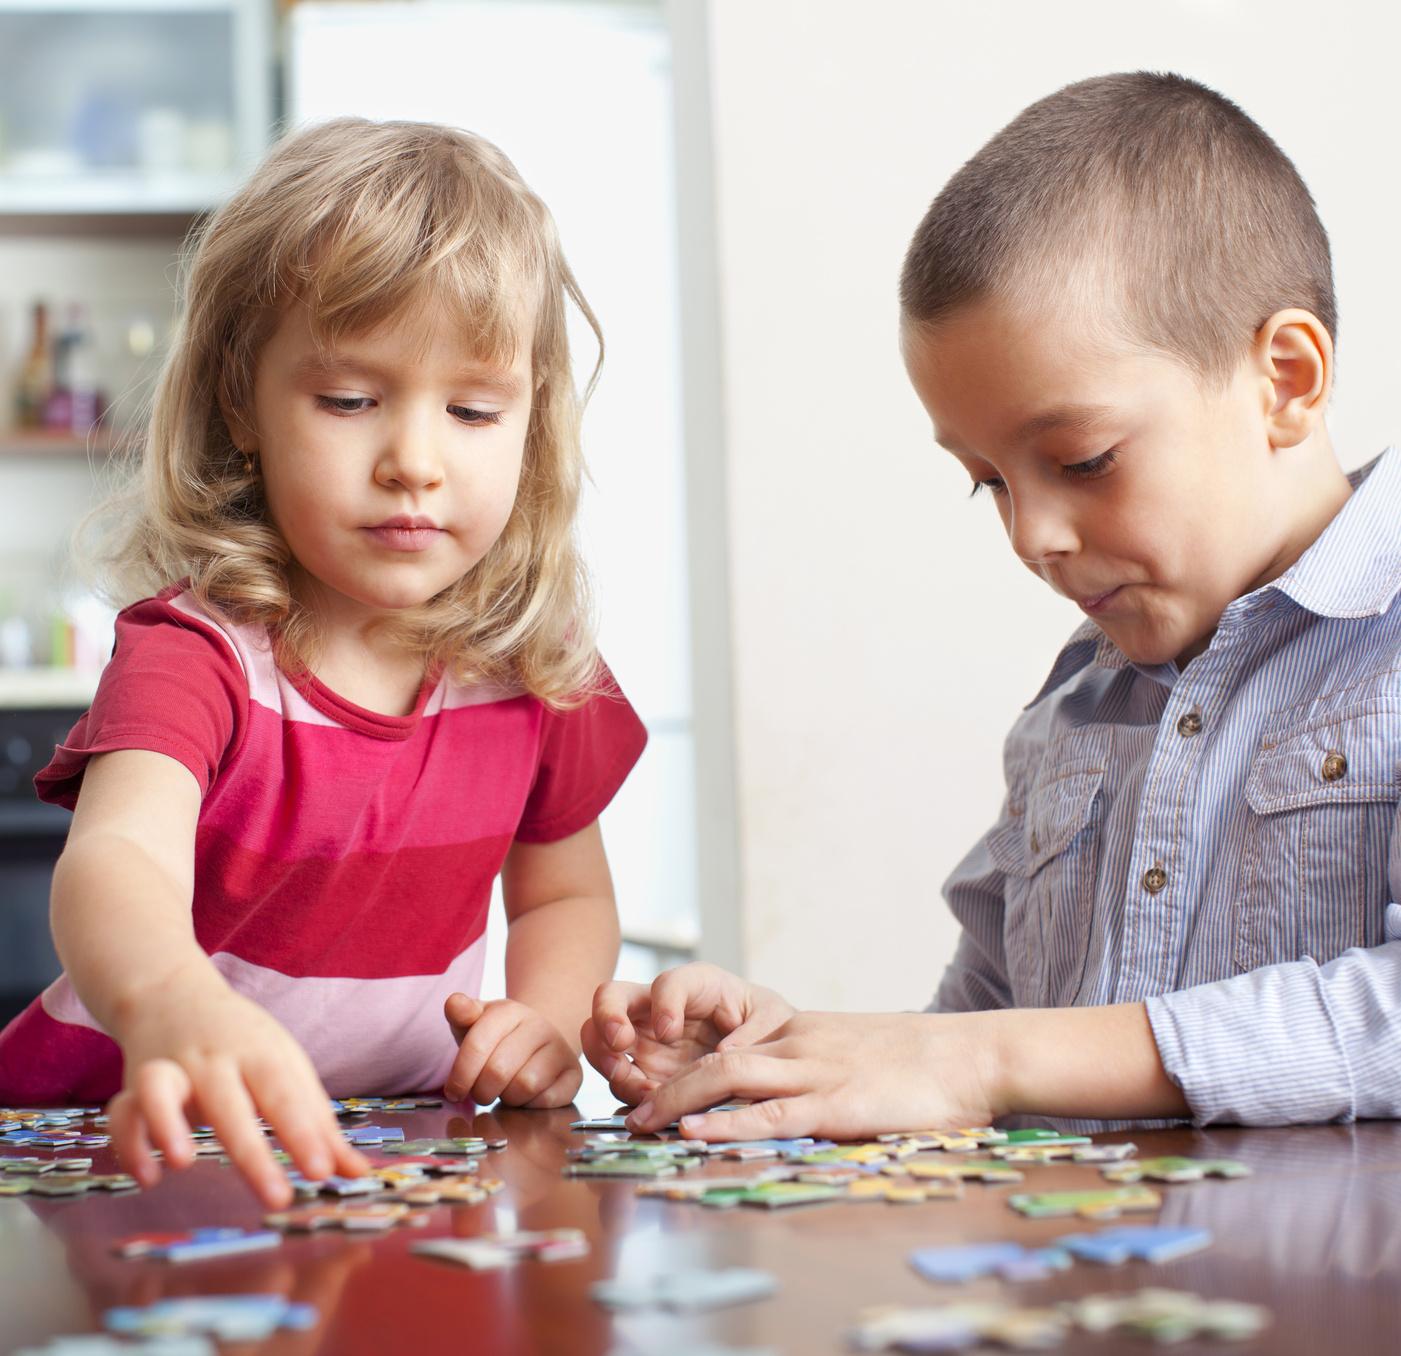 sf-preschoolers-doing-puzzle.jpg